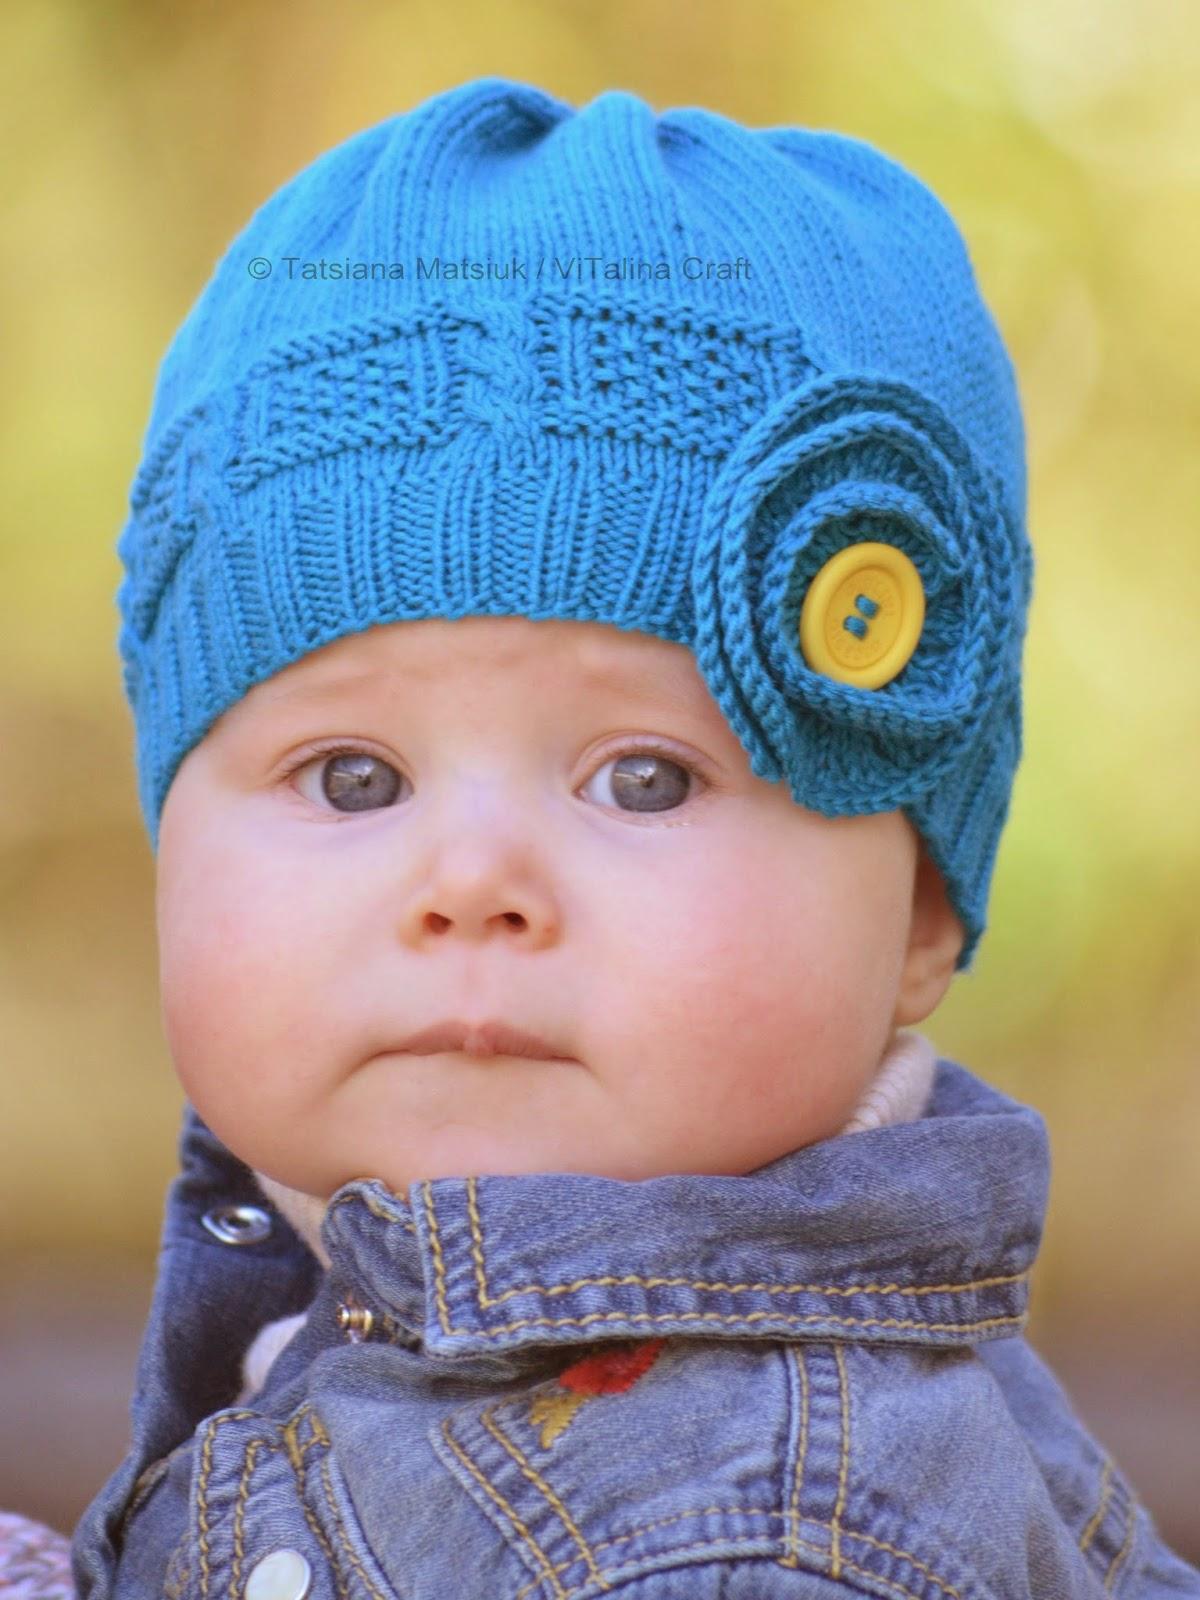 Azure Twist Flower Baby Hat Knitting Pattern | ViTalina Craft